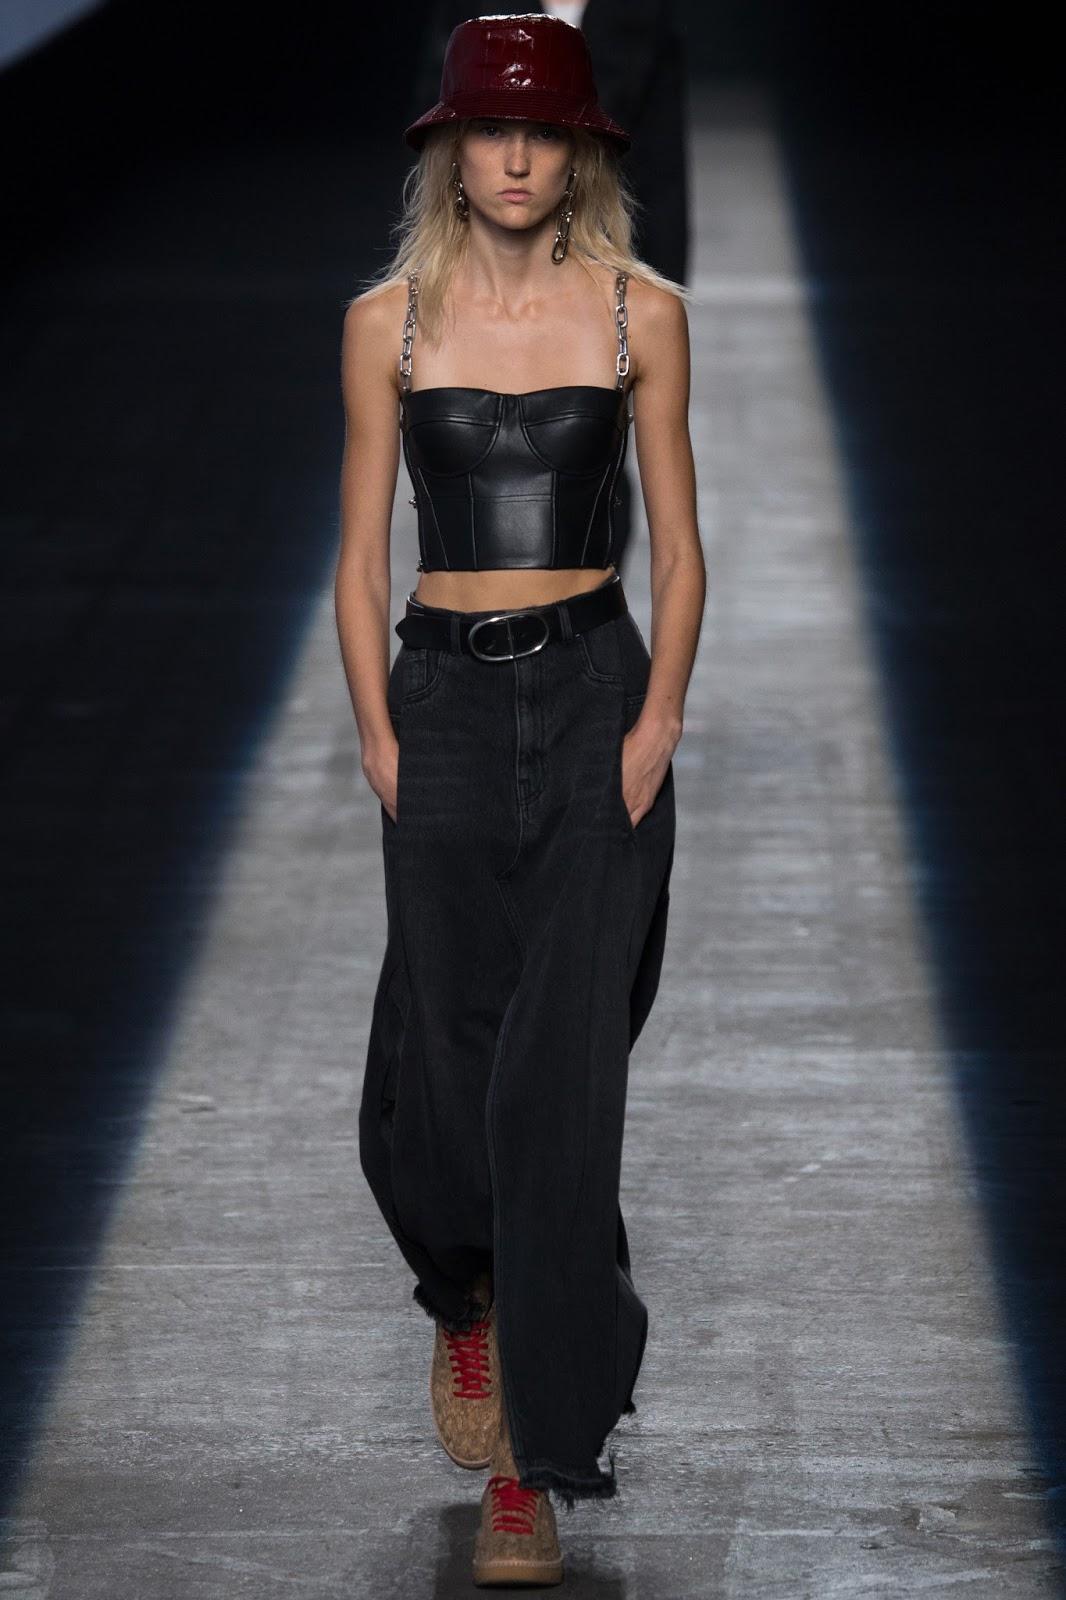 NYFW, new york fashion week, bucket hat chain link leather bustier